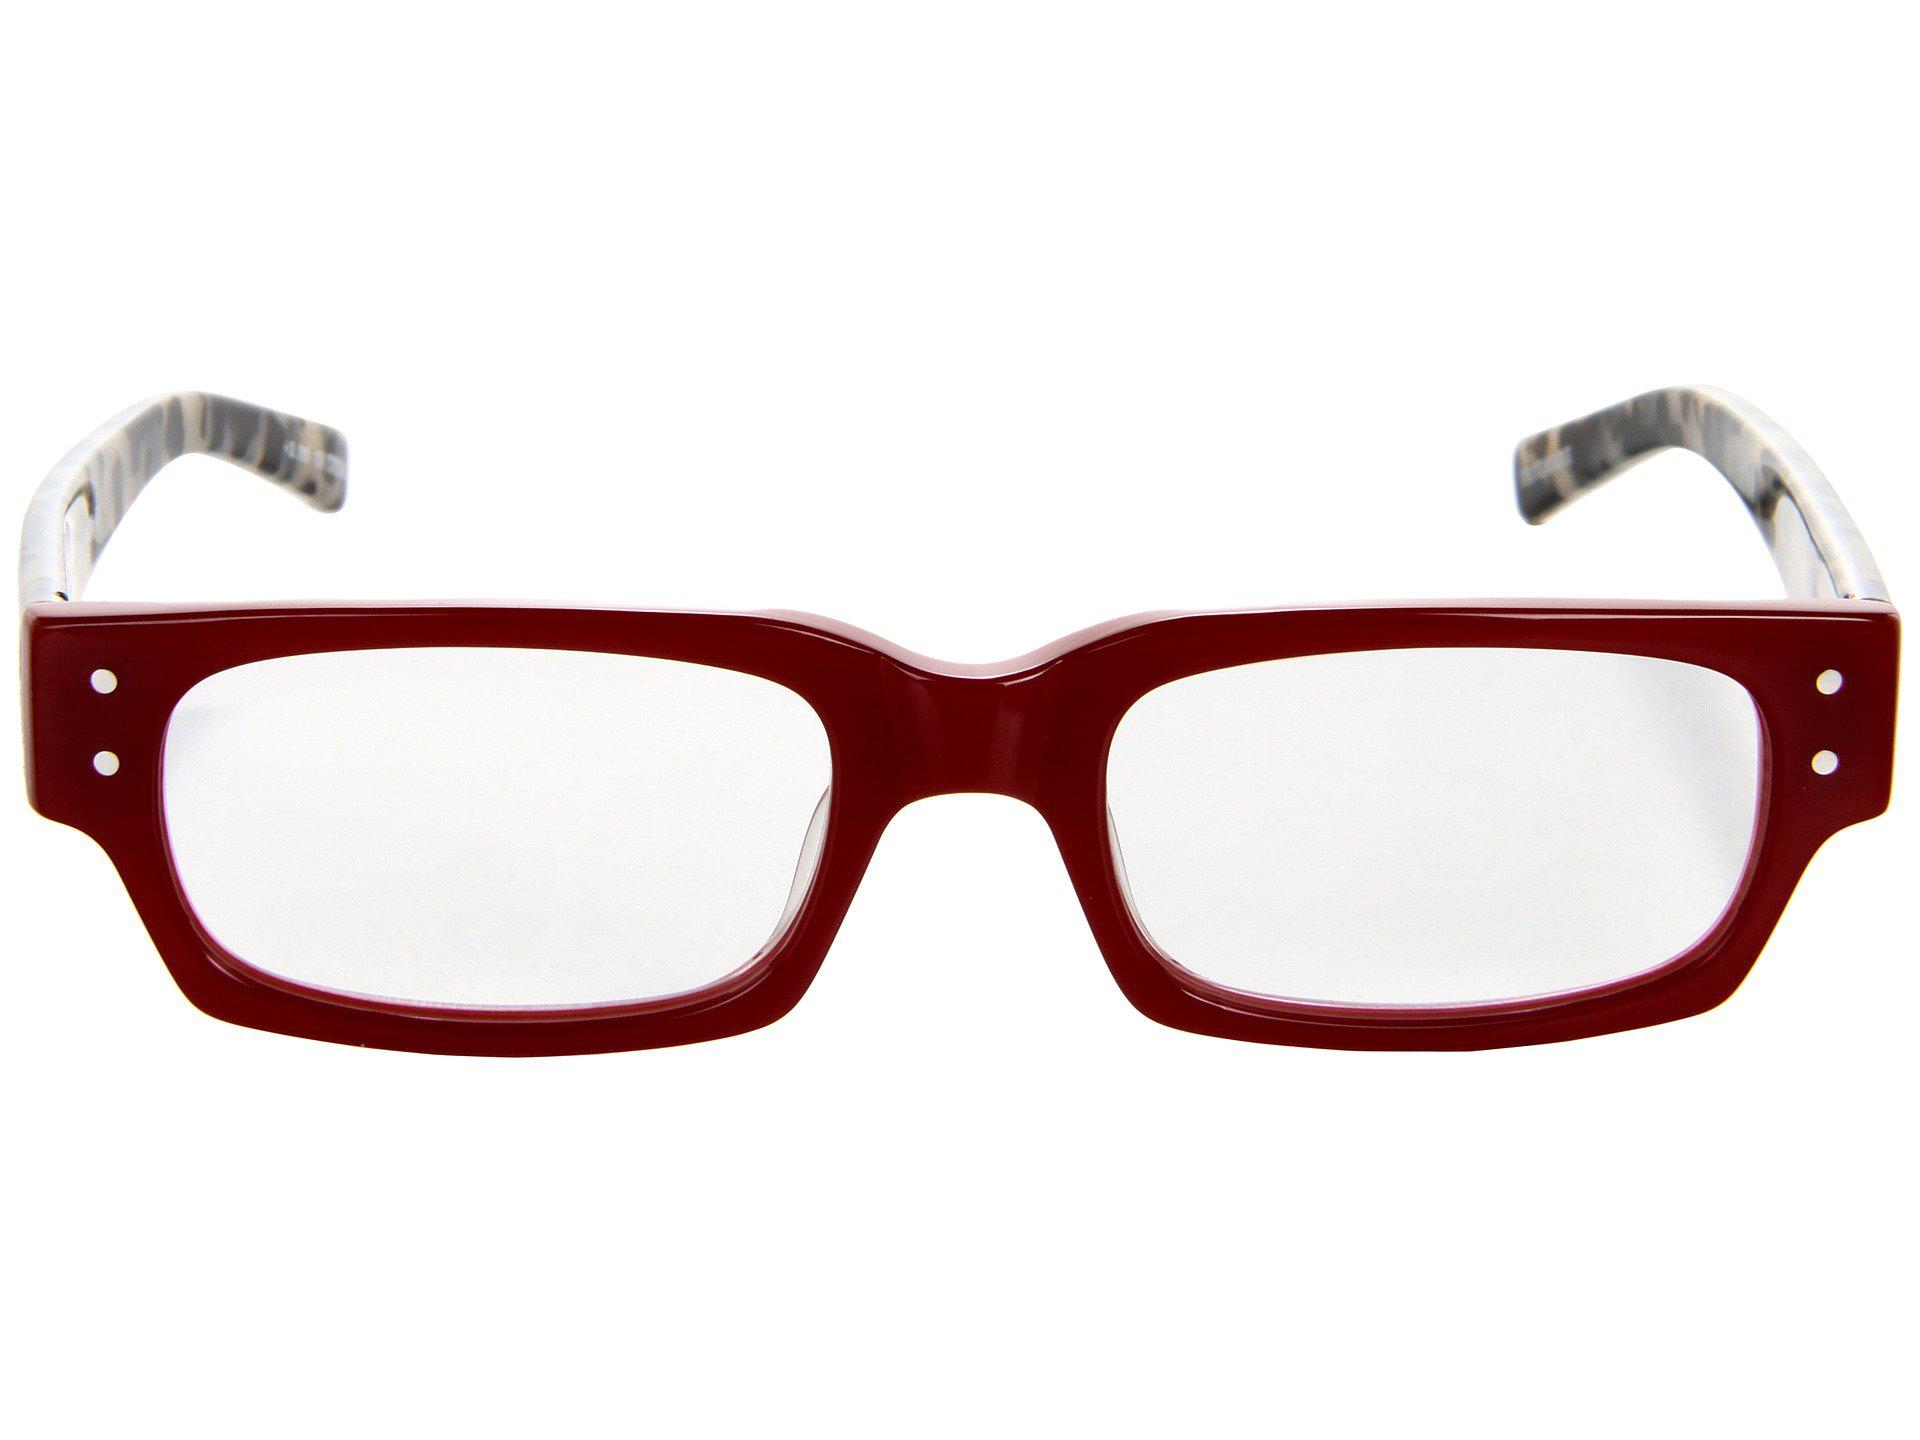 088dce40828 Eyebobs - Red Peckerhead Readers (blue Stripe) Reading Glasses Sunglasses -  Lyst. View fullscreen